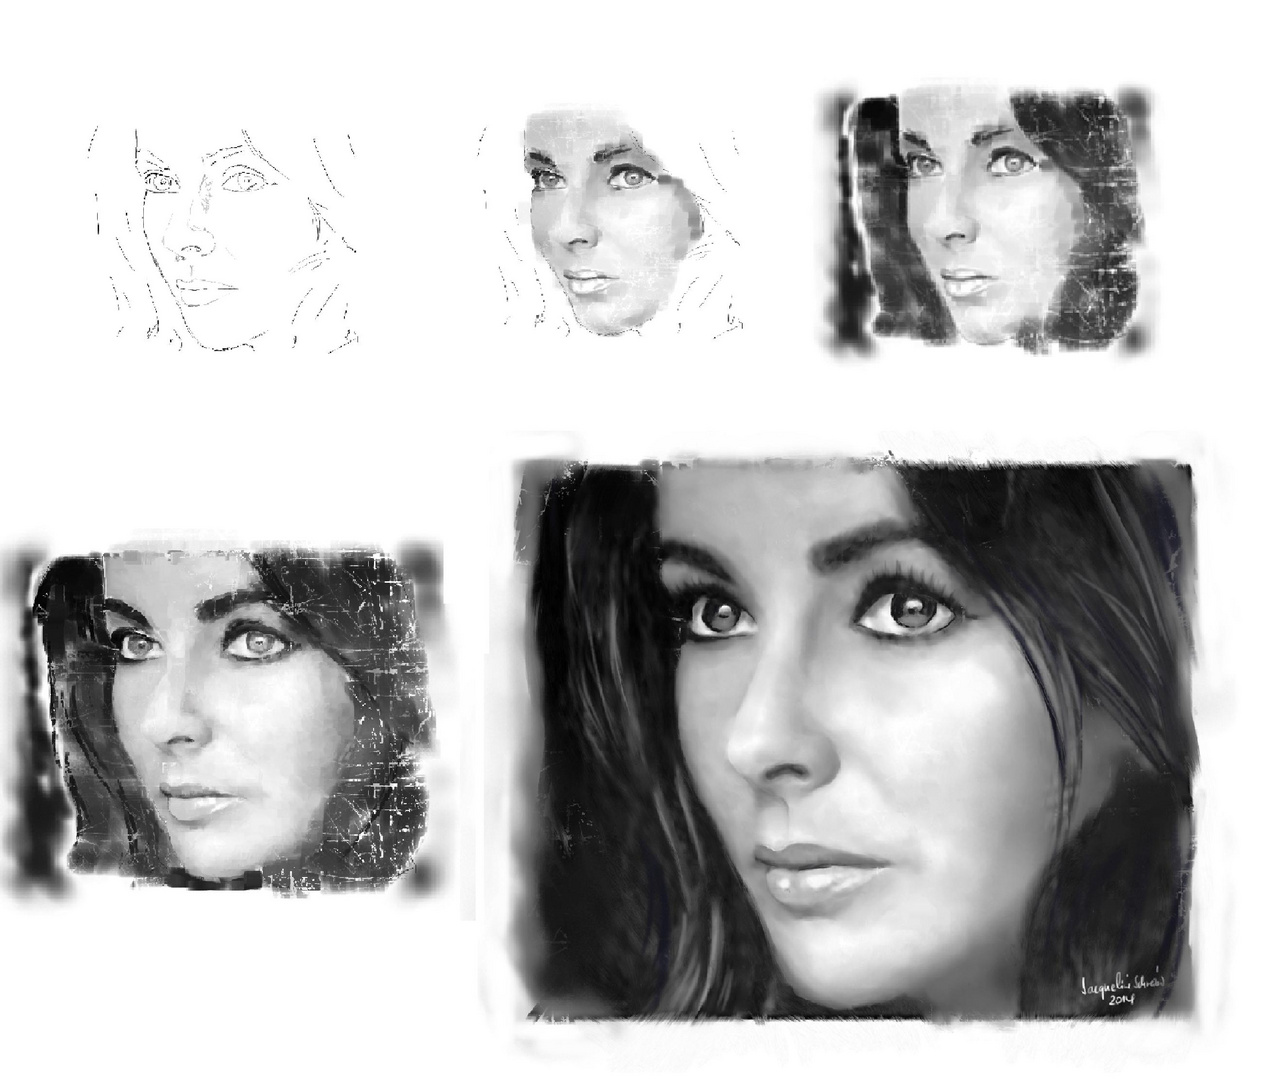 the progress .... Liz Taylor